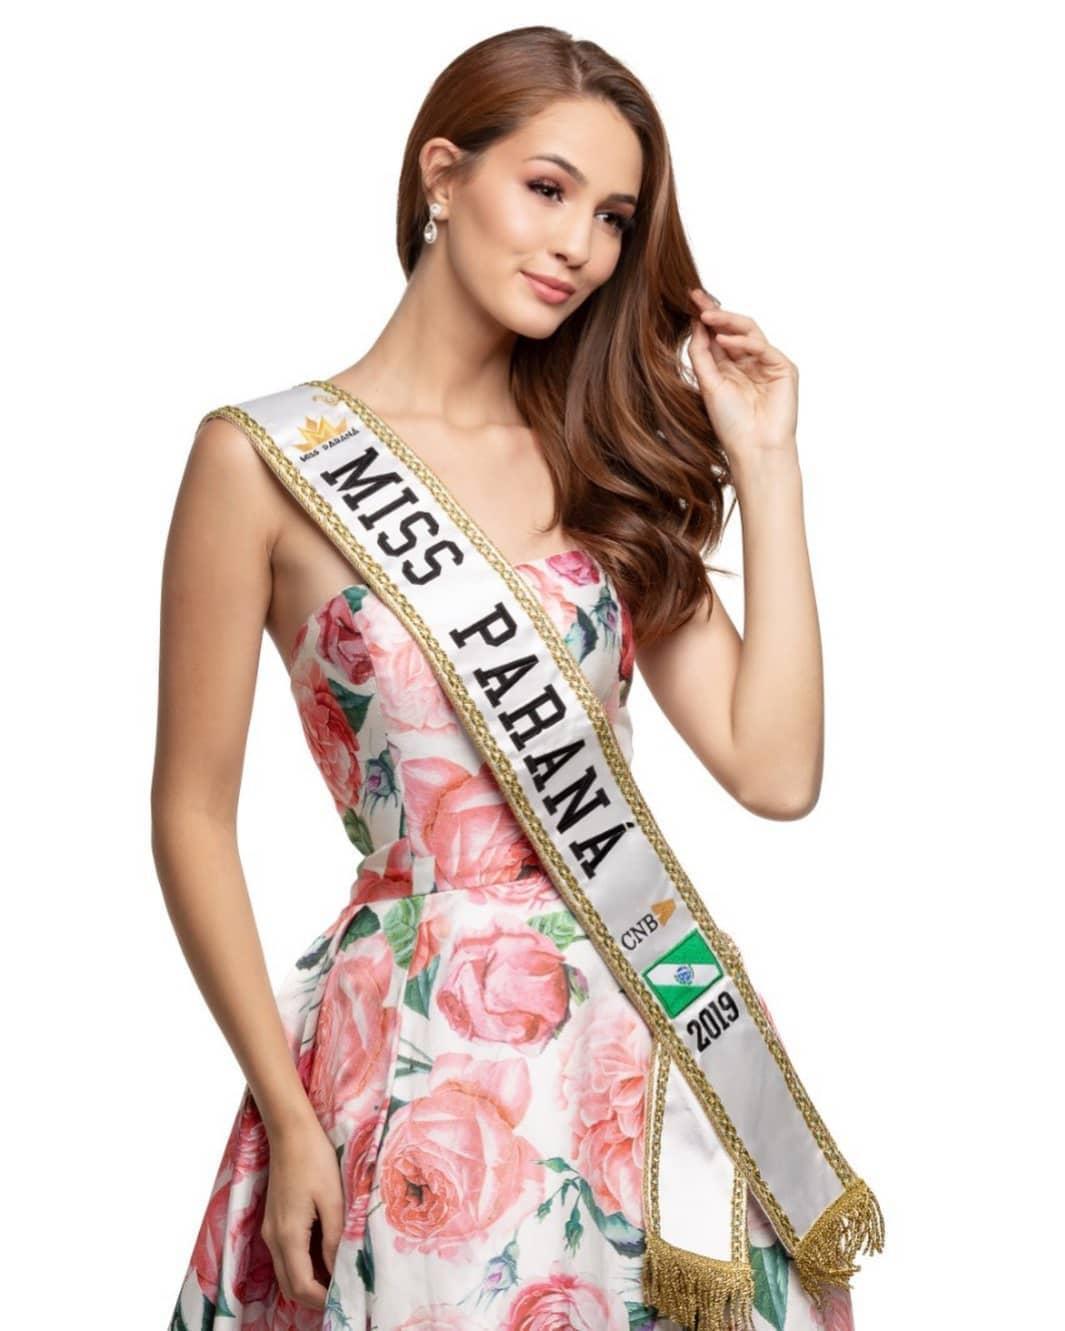 deise caroline ribas, top 10 de miss brasil mundo 2019/miss parana universo 2018/top 2 de miss teen international 2017. - Página 5 21049613